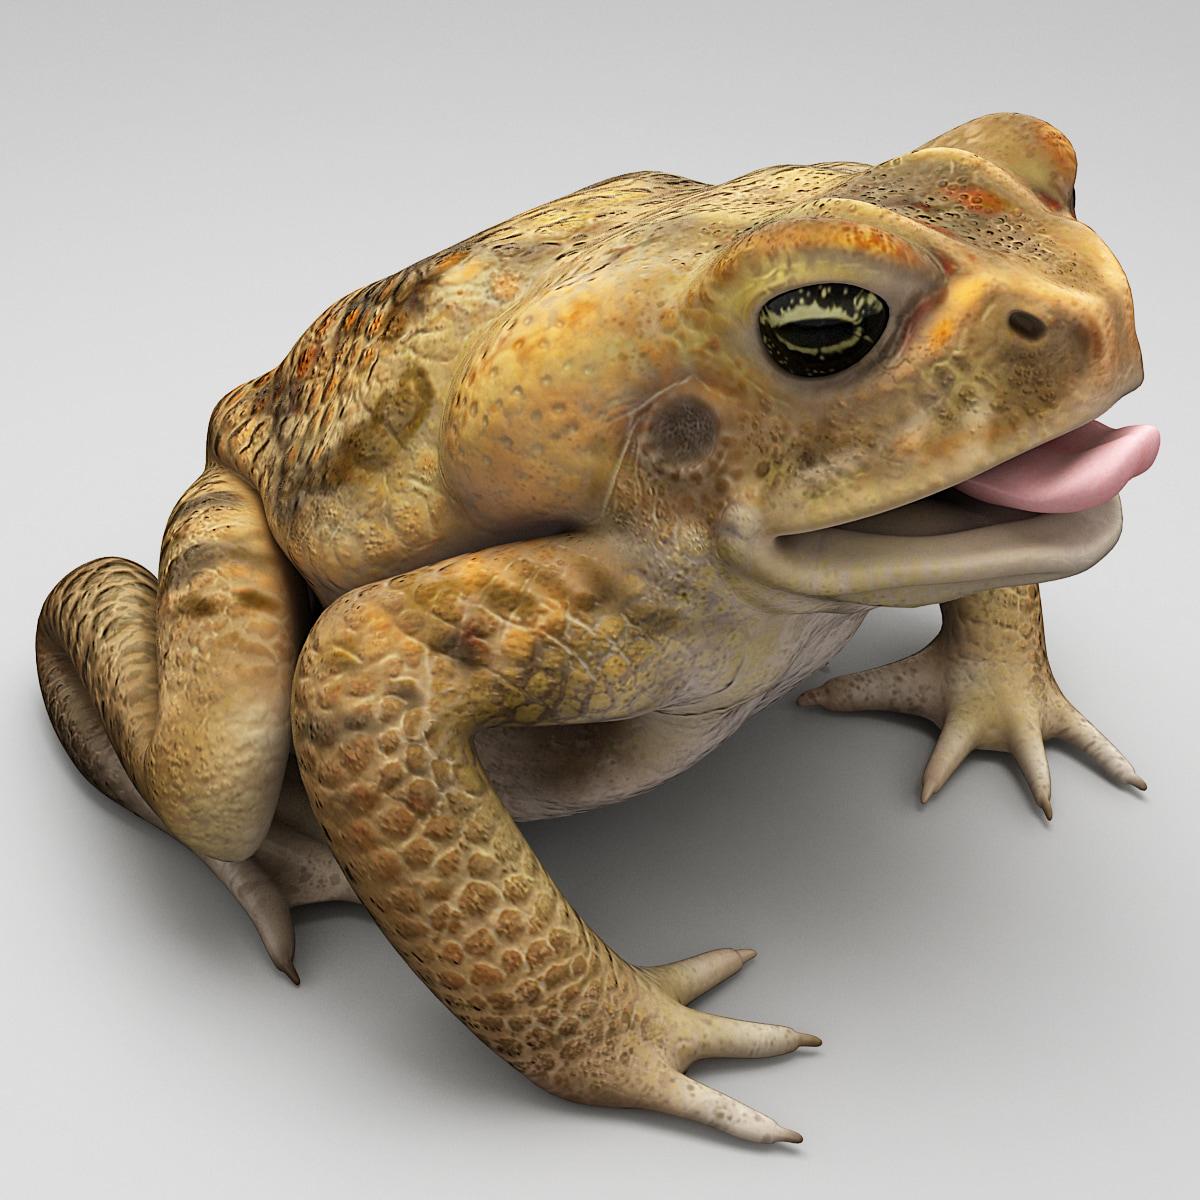 Frog_Cane_Toad_0002.jpg